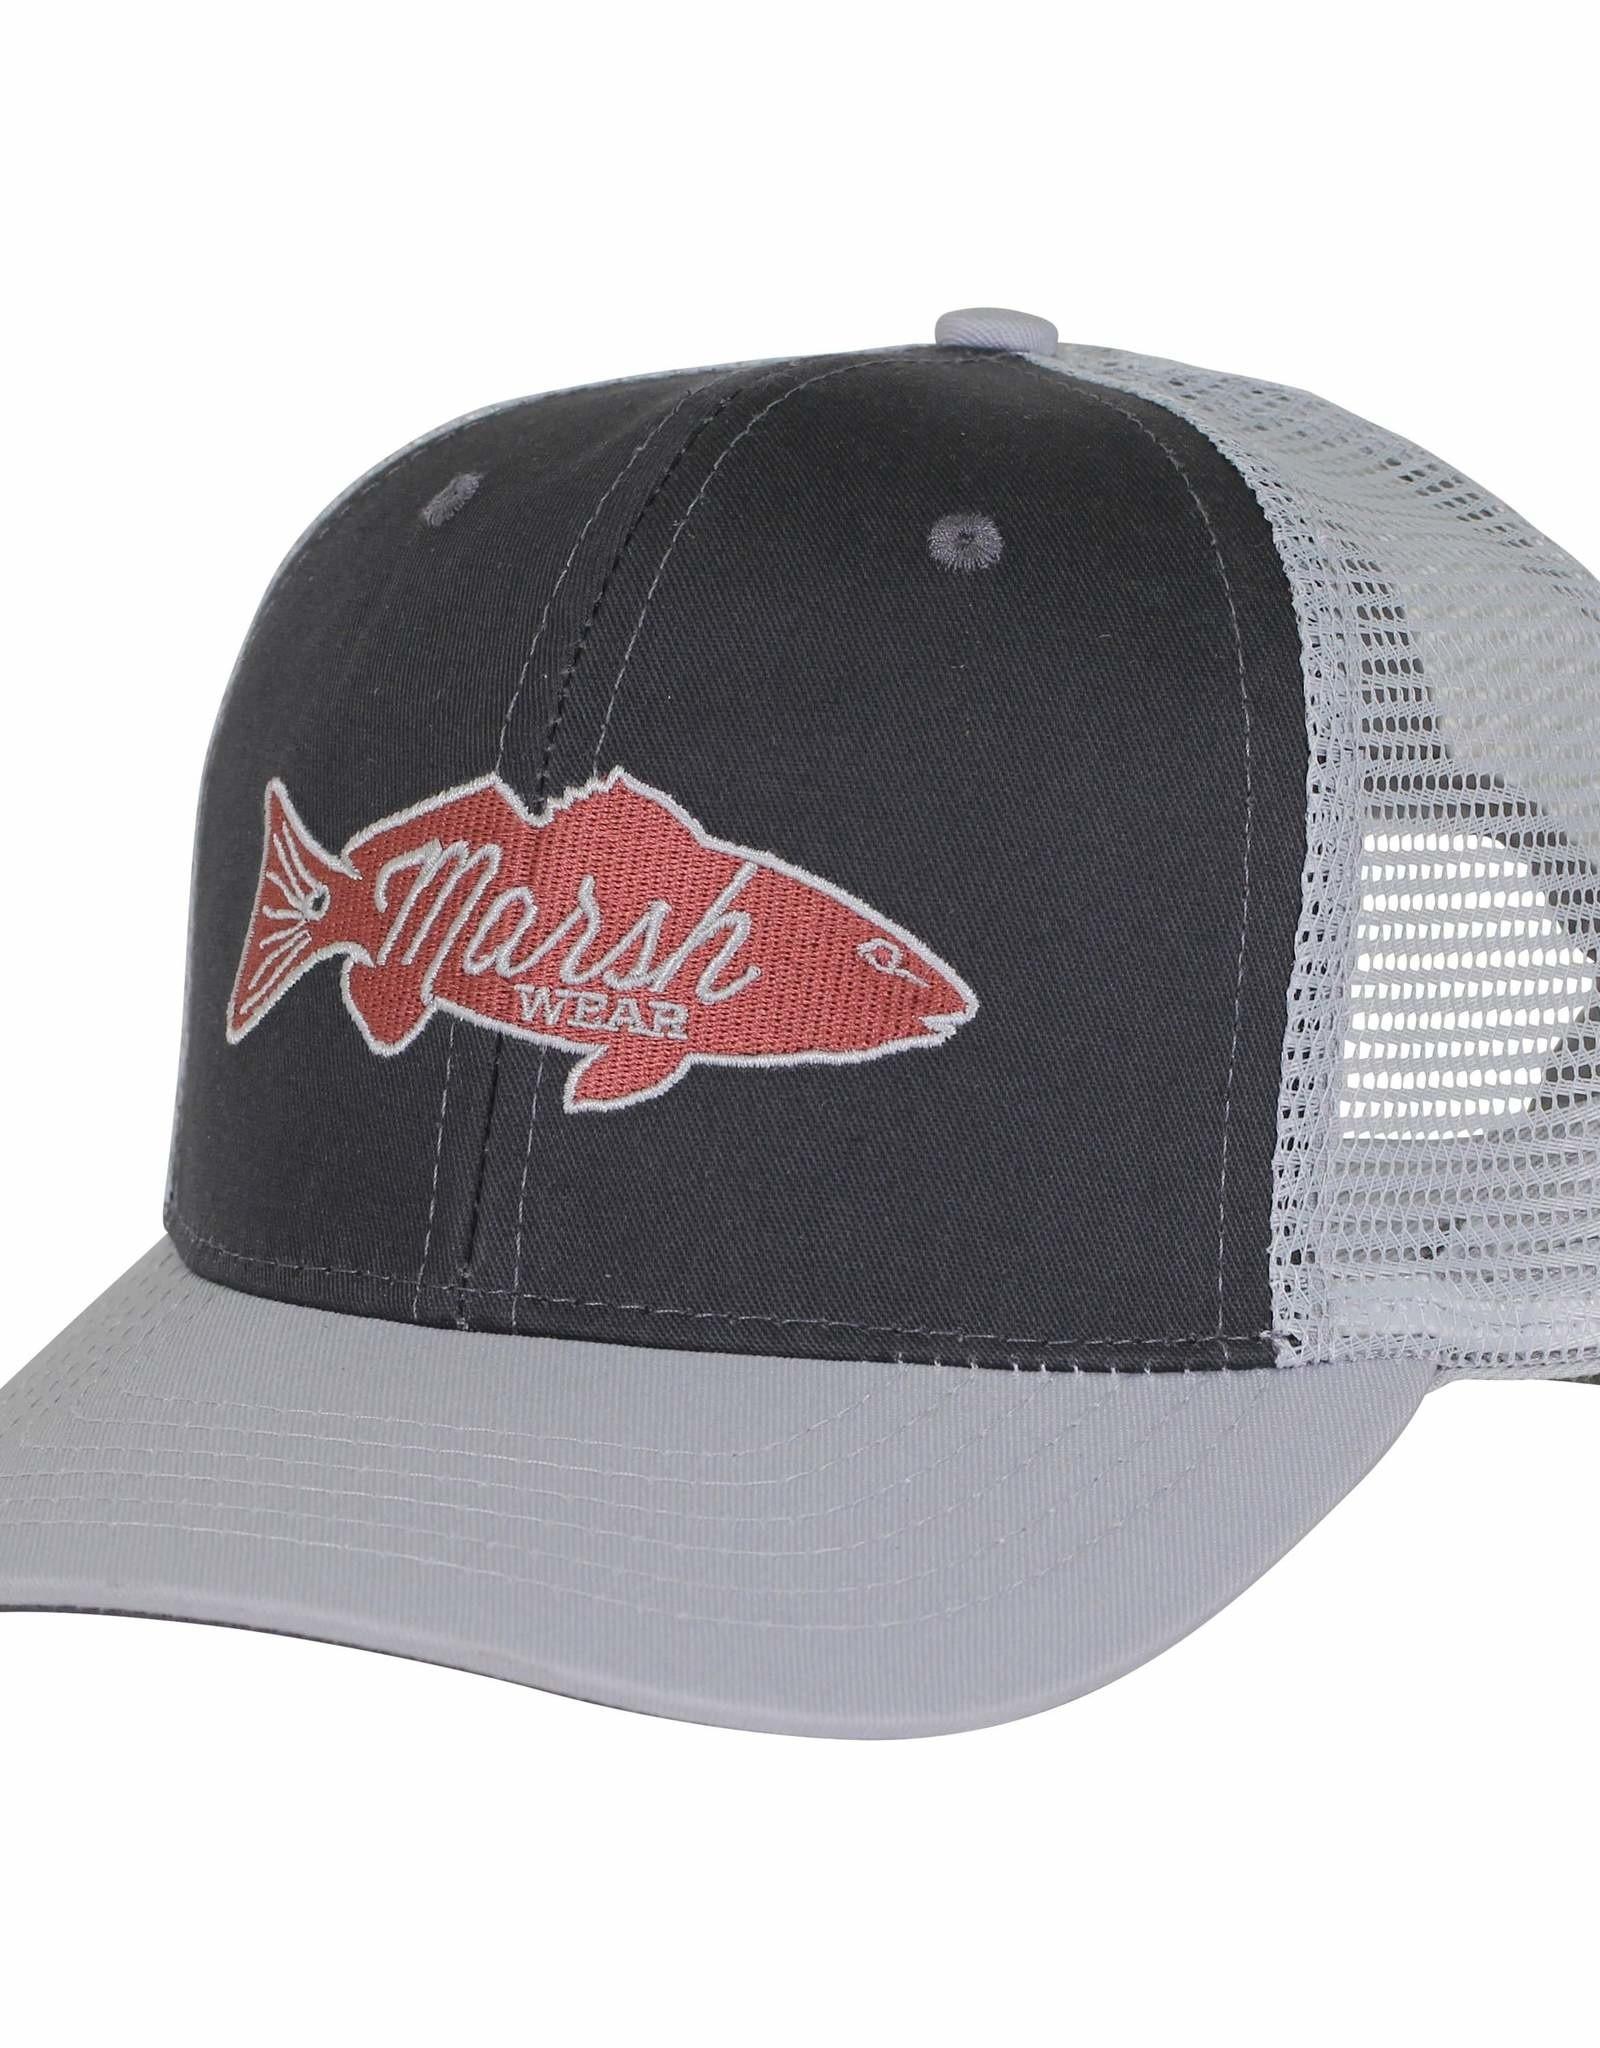 Retro Redfish Trucker Hat